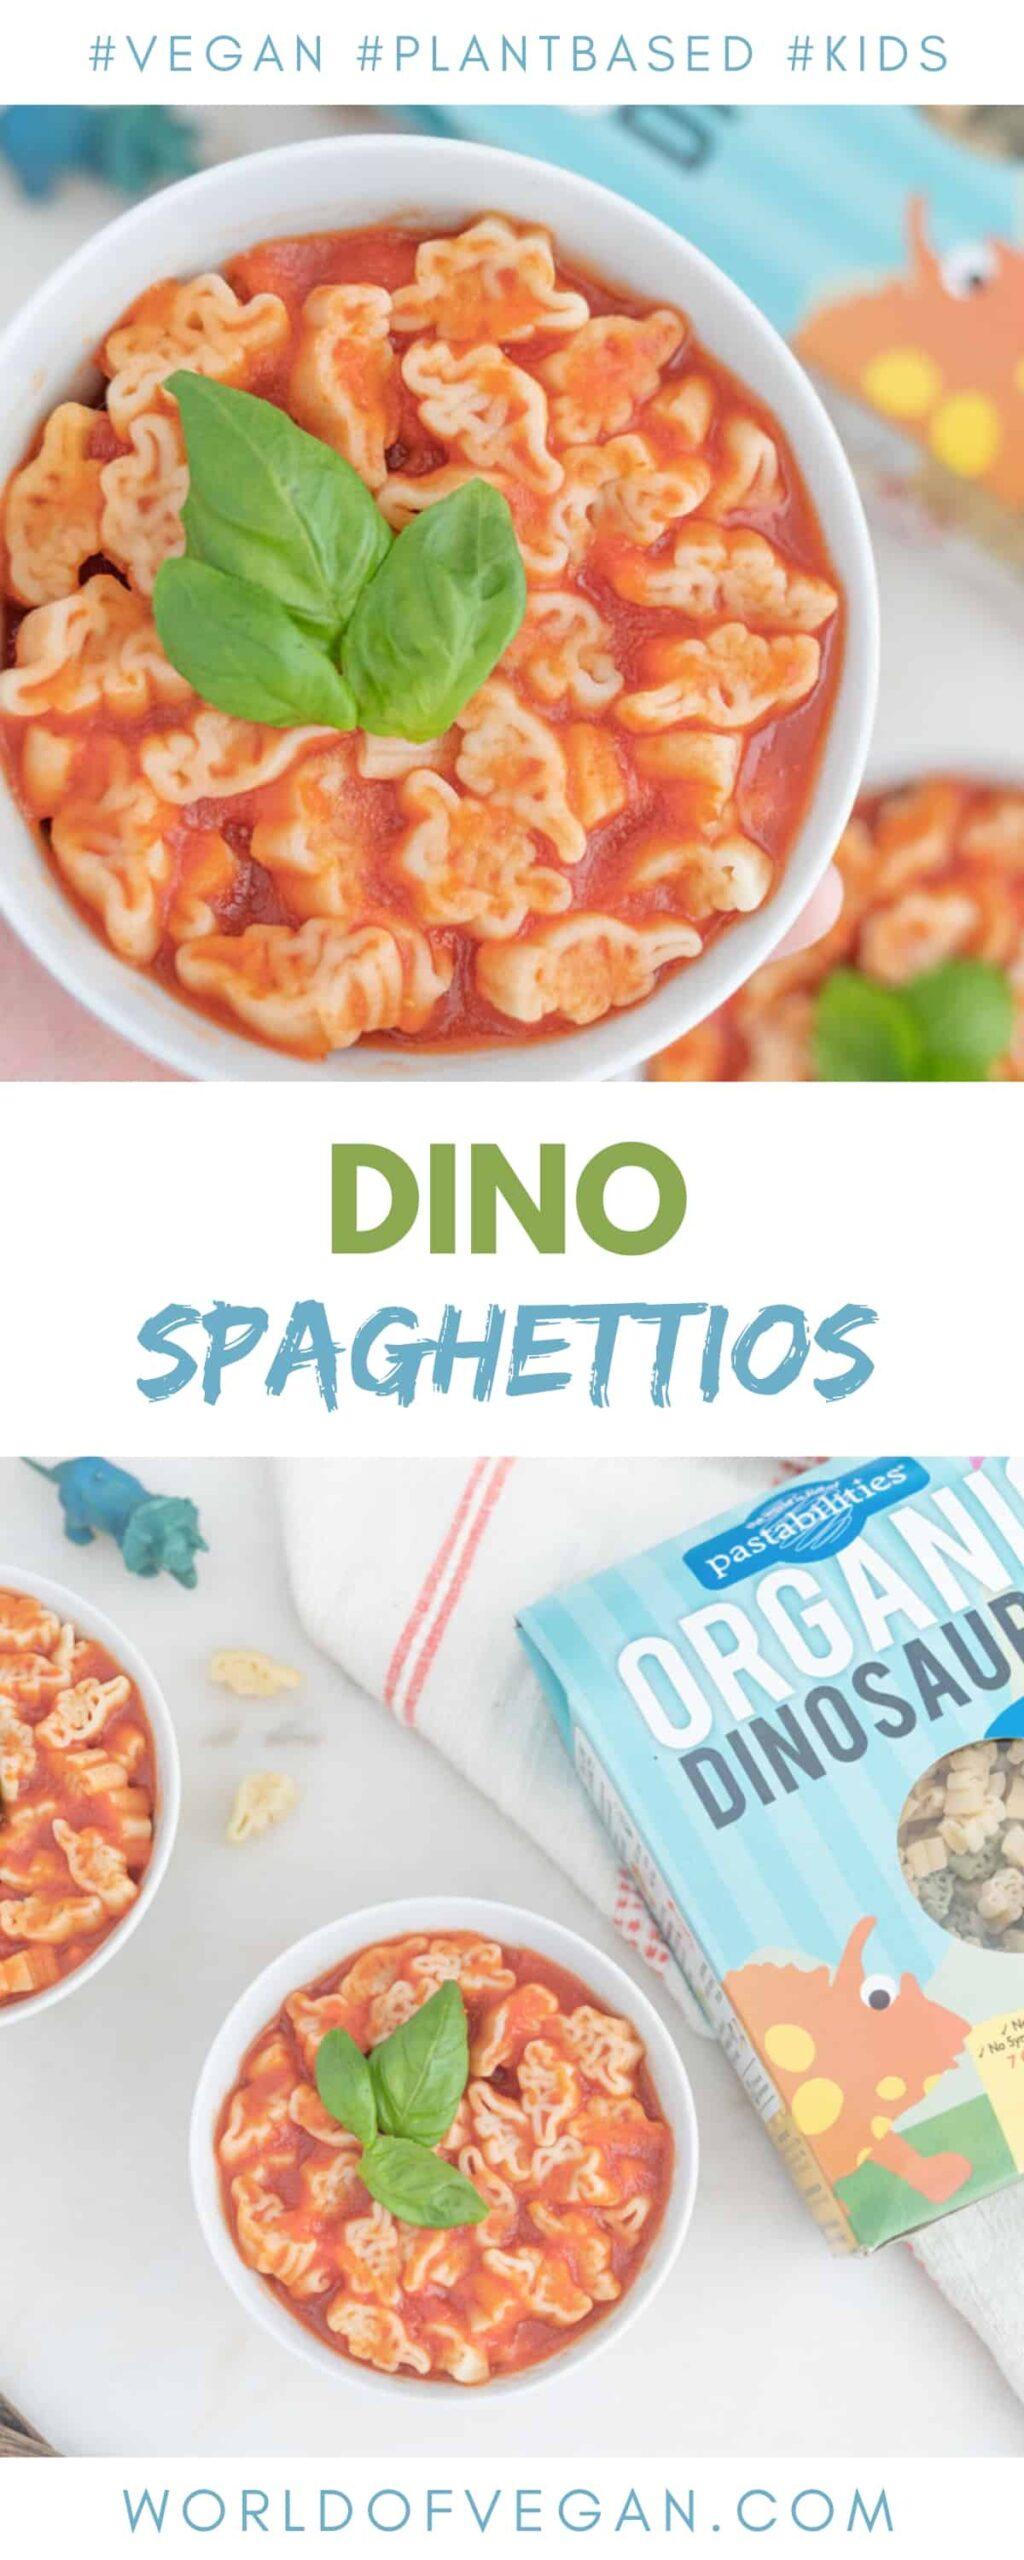 Dino Spaghettios—Homemade Vegan Spaghettios With Dinosaur Pasta